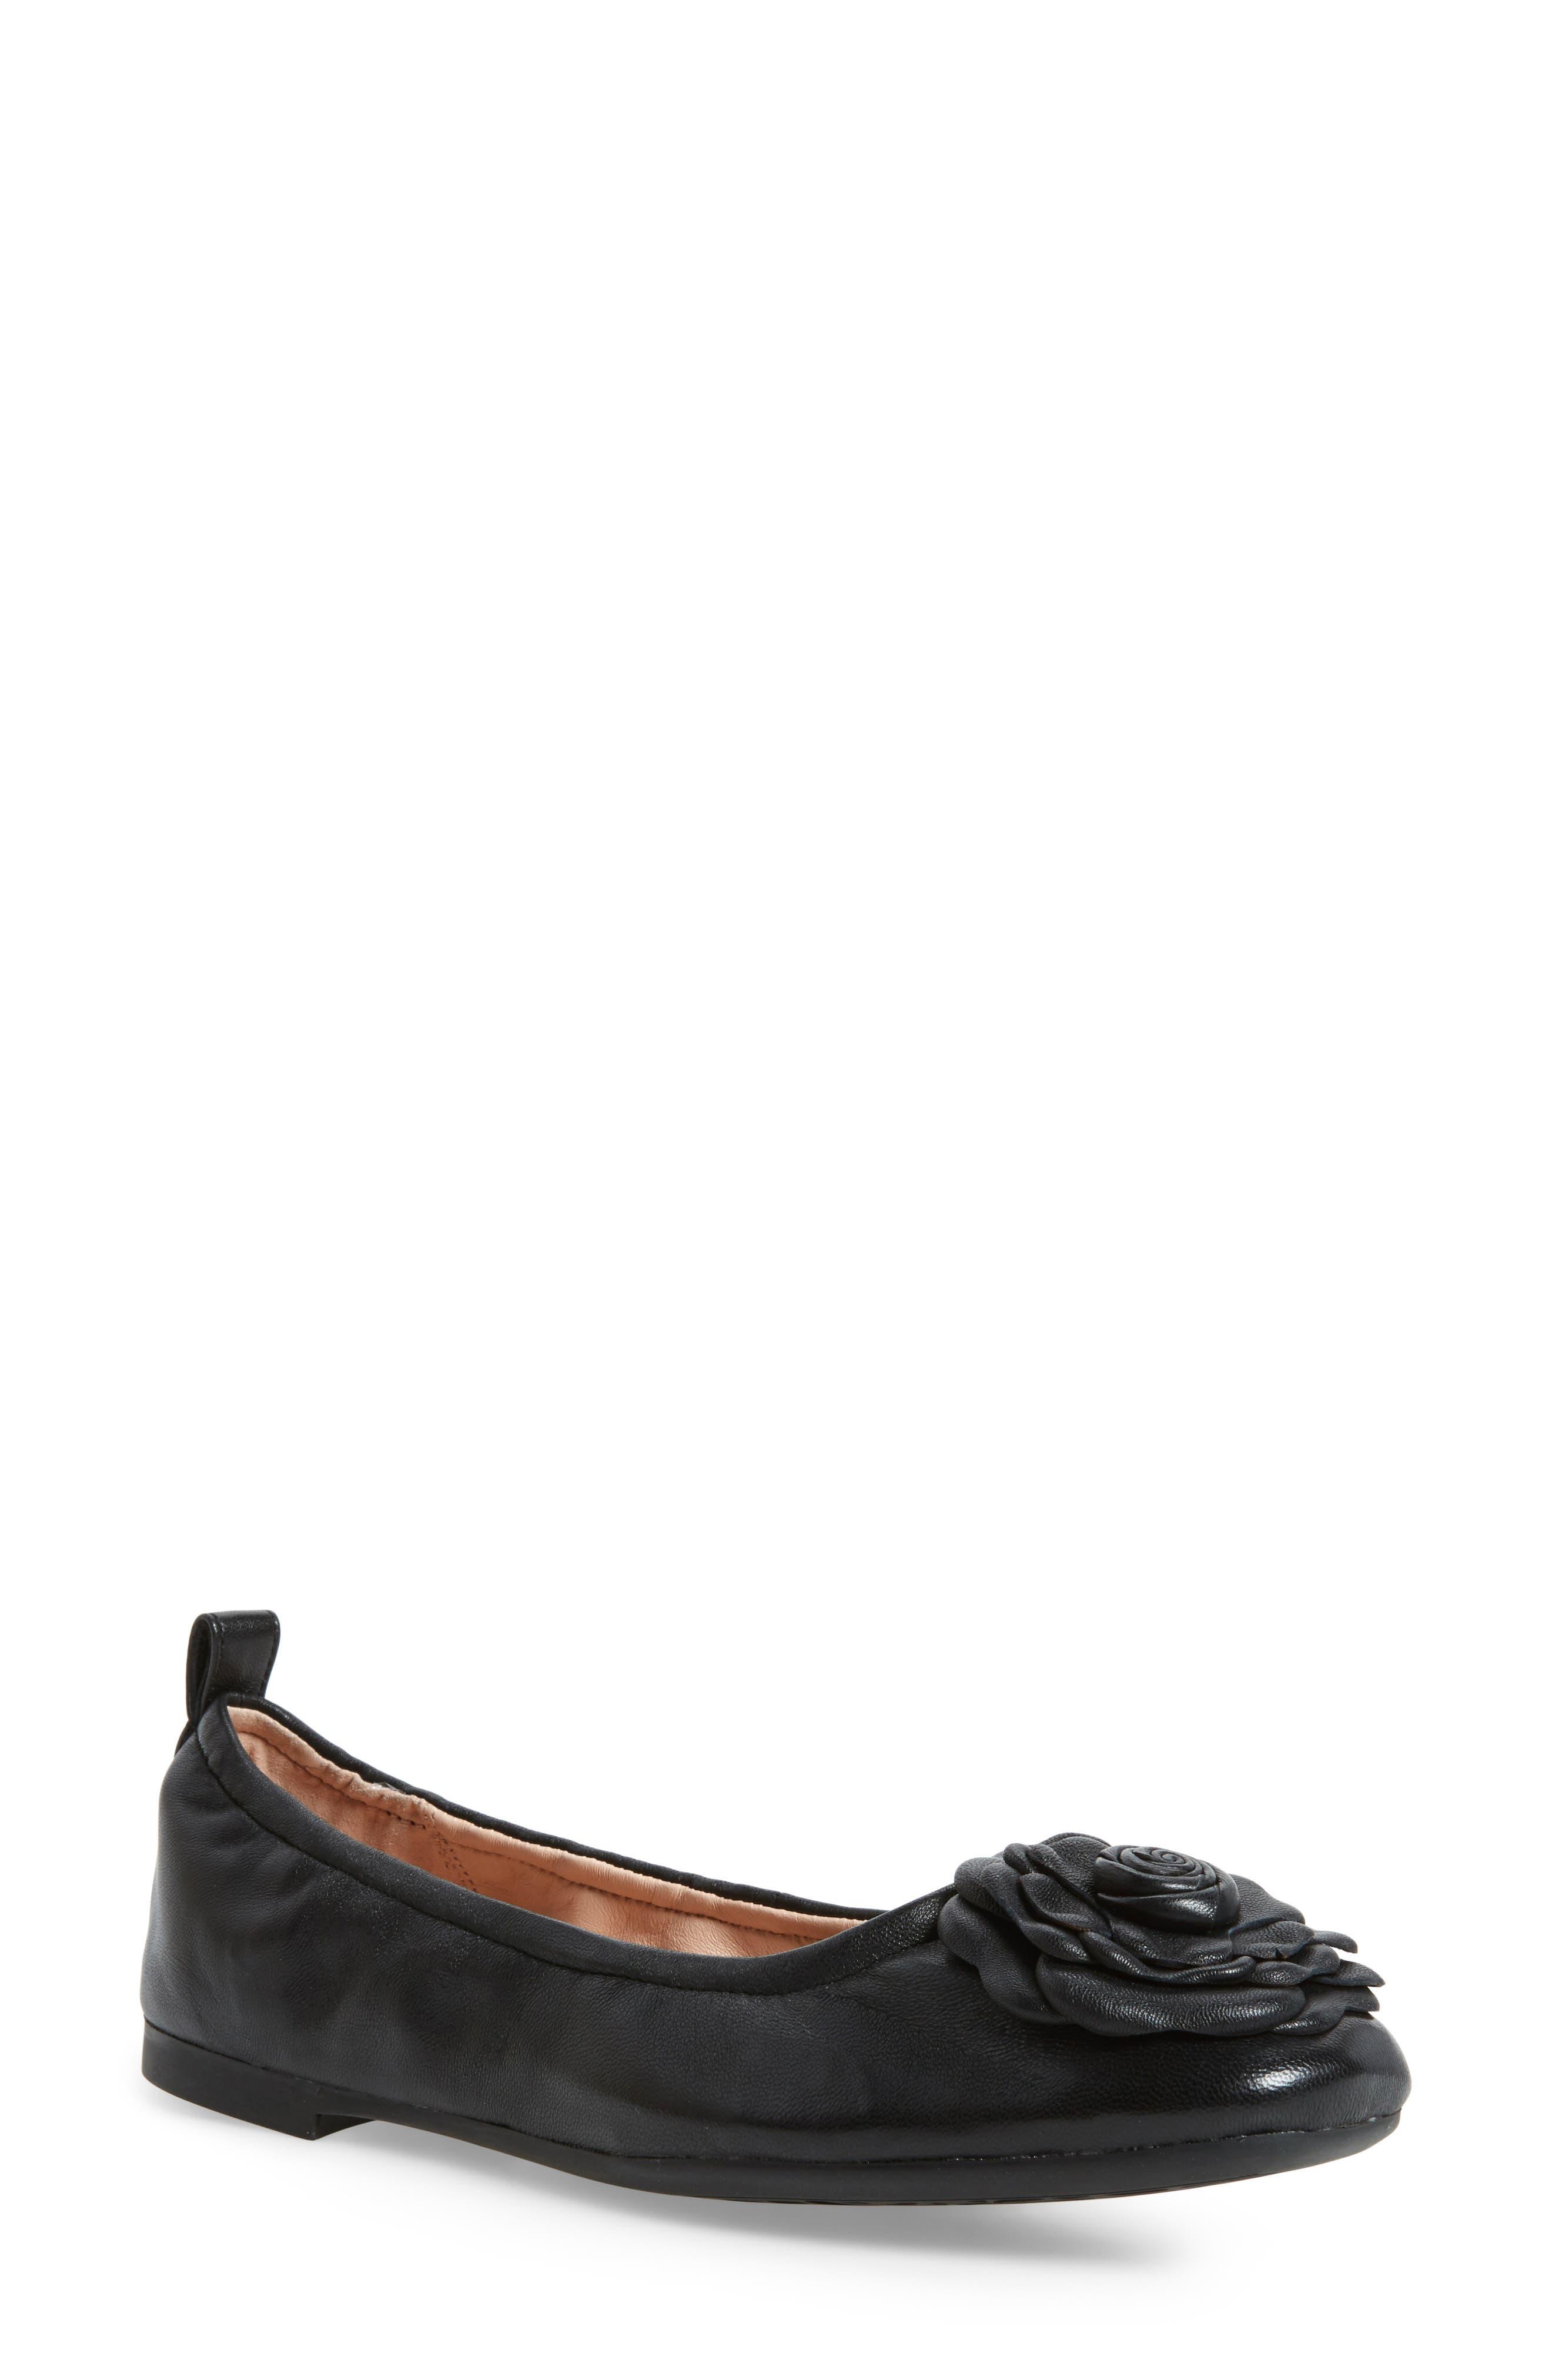 TARYN ROSE Rosalyn Leather Ballet Flats in Black Leather